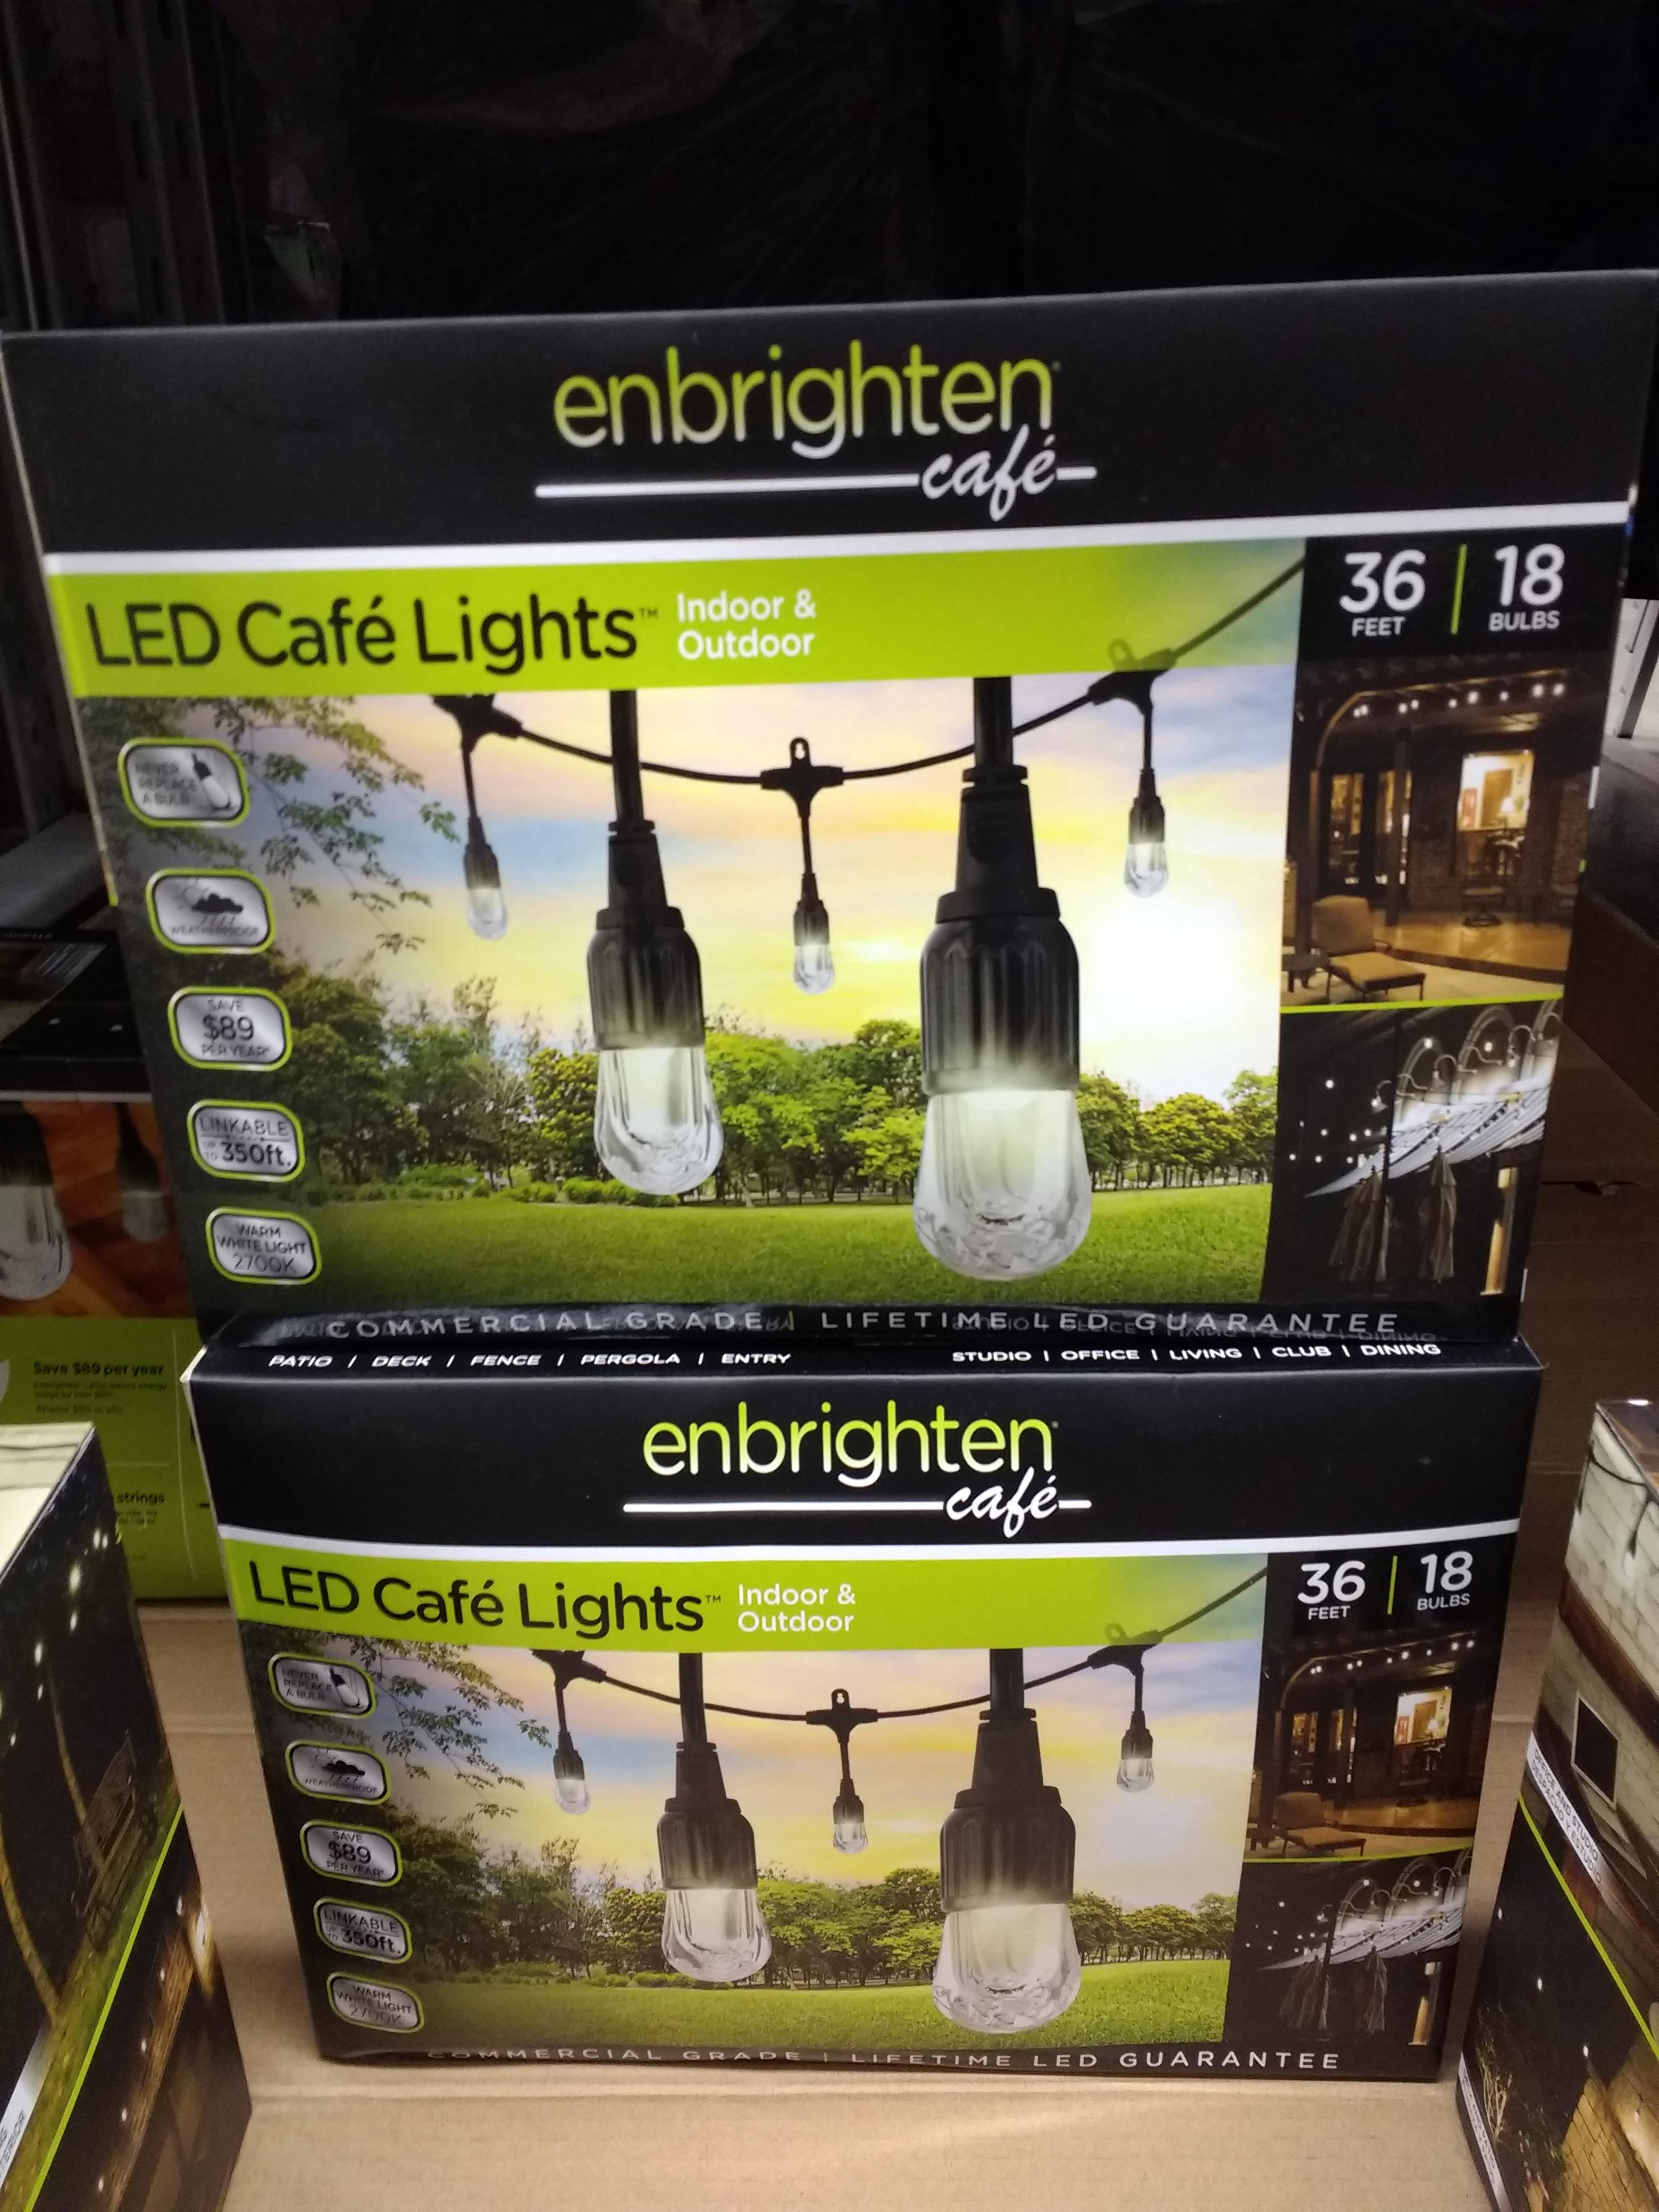 Enbrighten 36' Strand LED Acrylic Café String Lights (18 bulbs) - $9.91 @ SamsClub B&M (End of Season Clearance - YMMV)